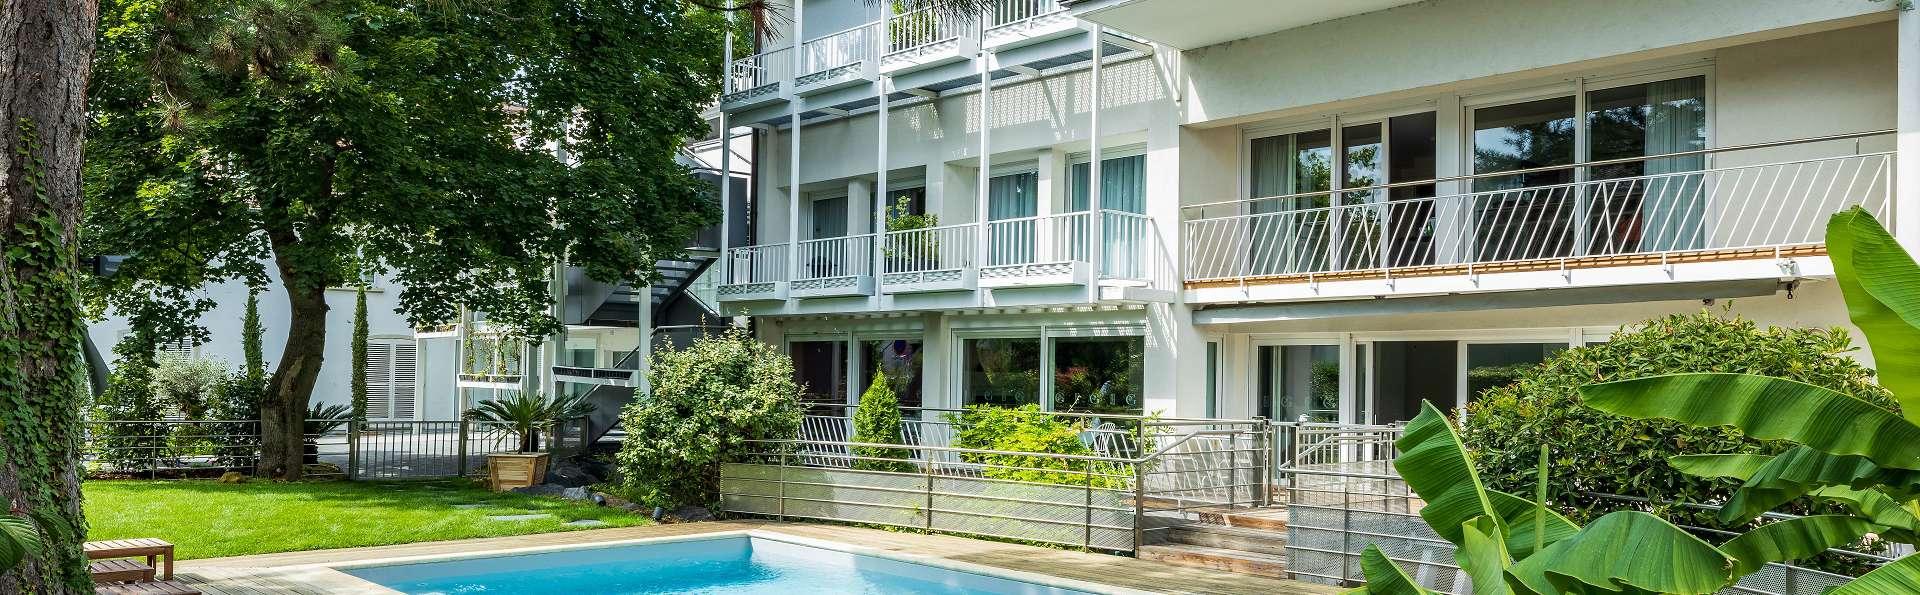 Garrigae Villa La Florangerie - EDIT_ext_piscine_8.jpg